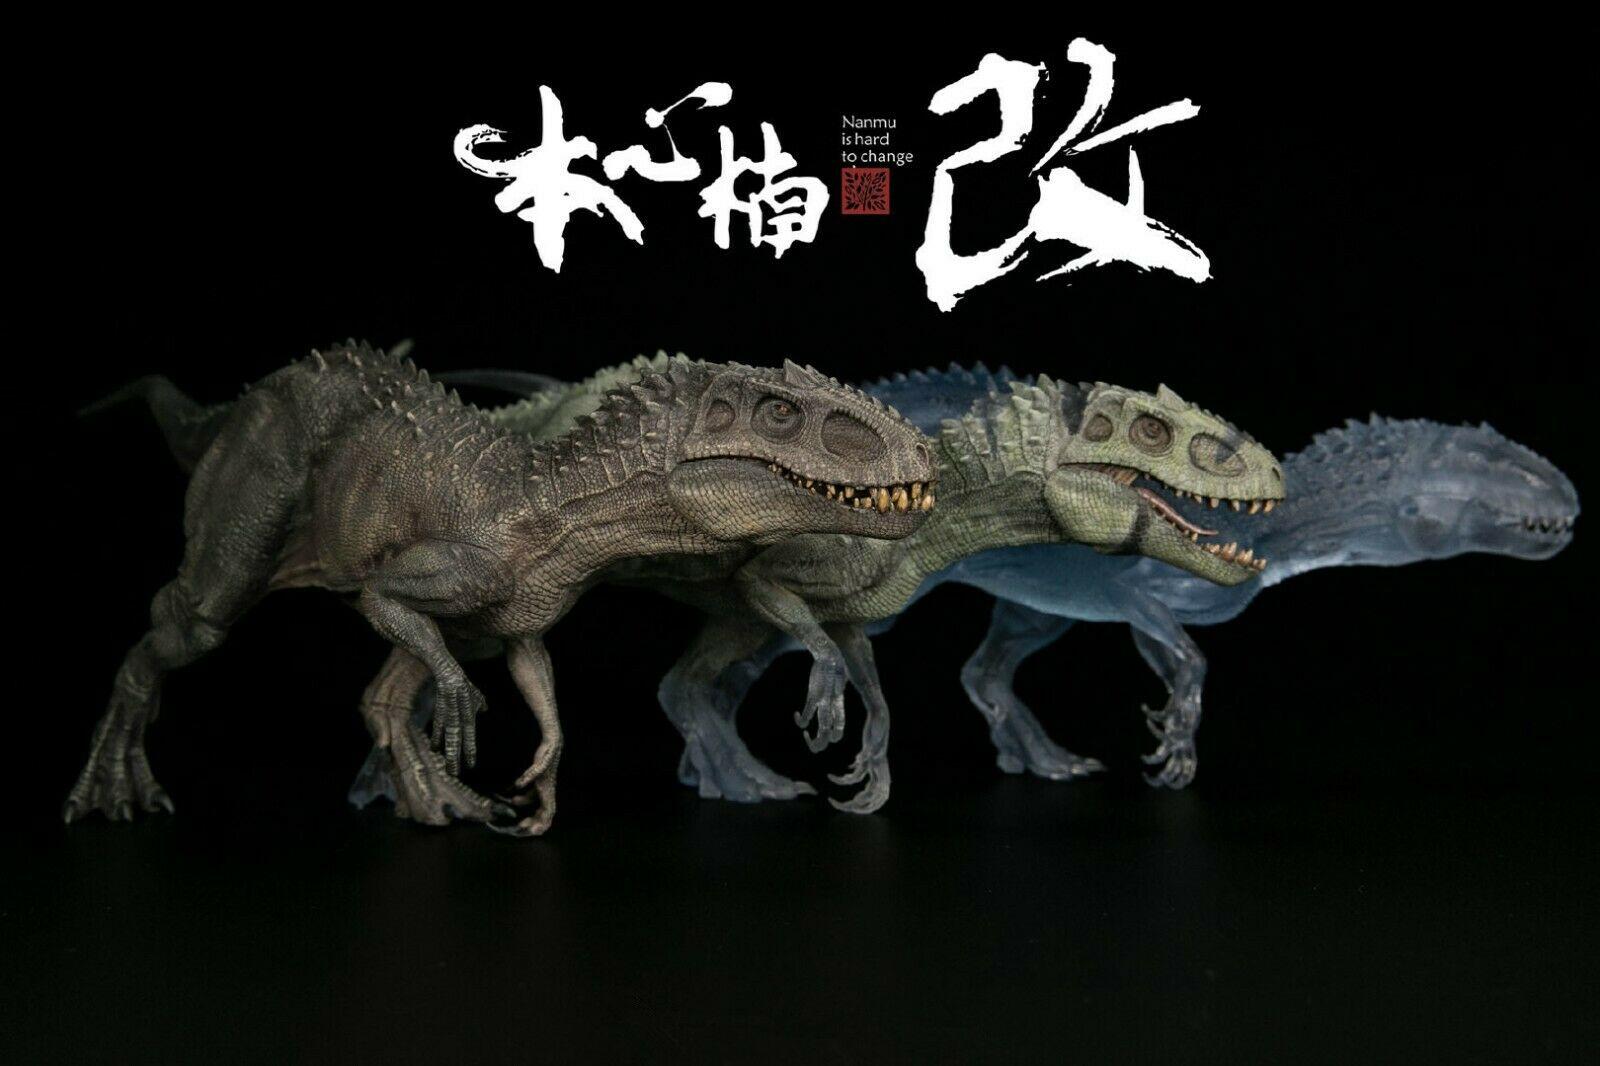 1:35 Transparent Translucent Bereserker Rex Indominus Jurassic Dinosaur Animal Model Figure Ancient Biological Adult Collection